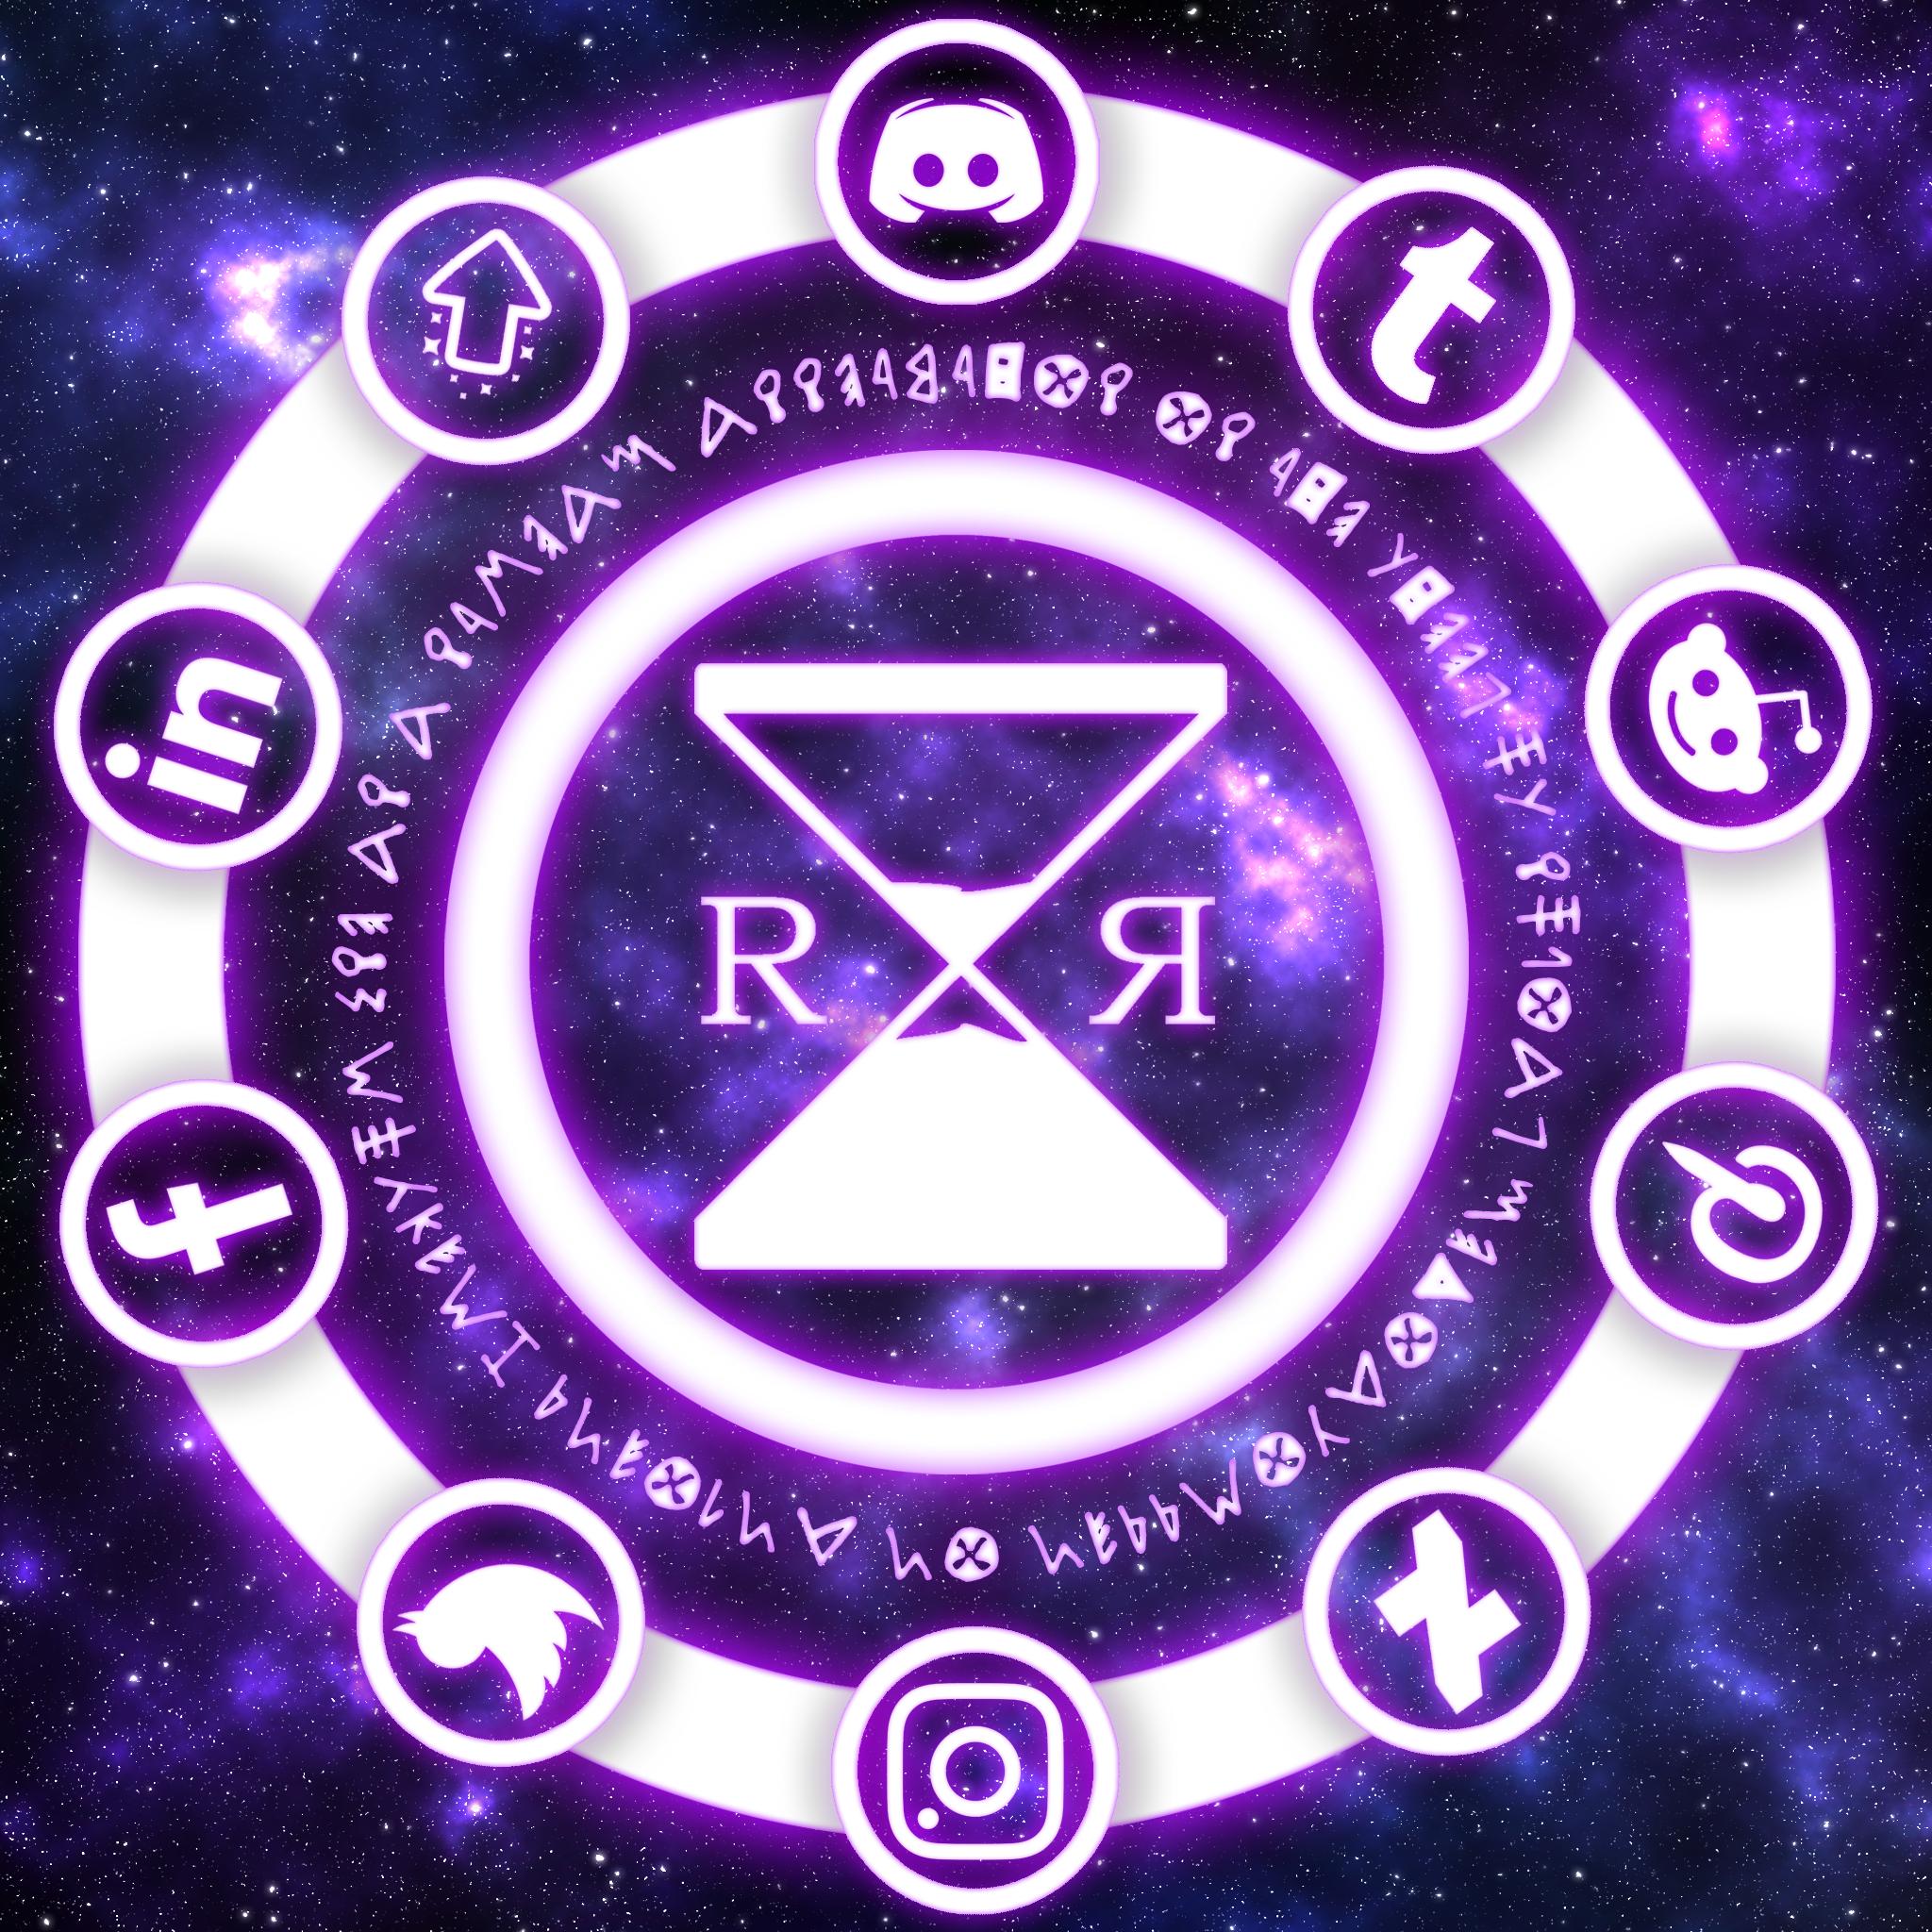 Social Media Wheel Twitch, Art pieces, Let it be